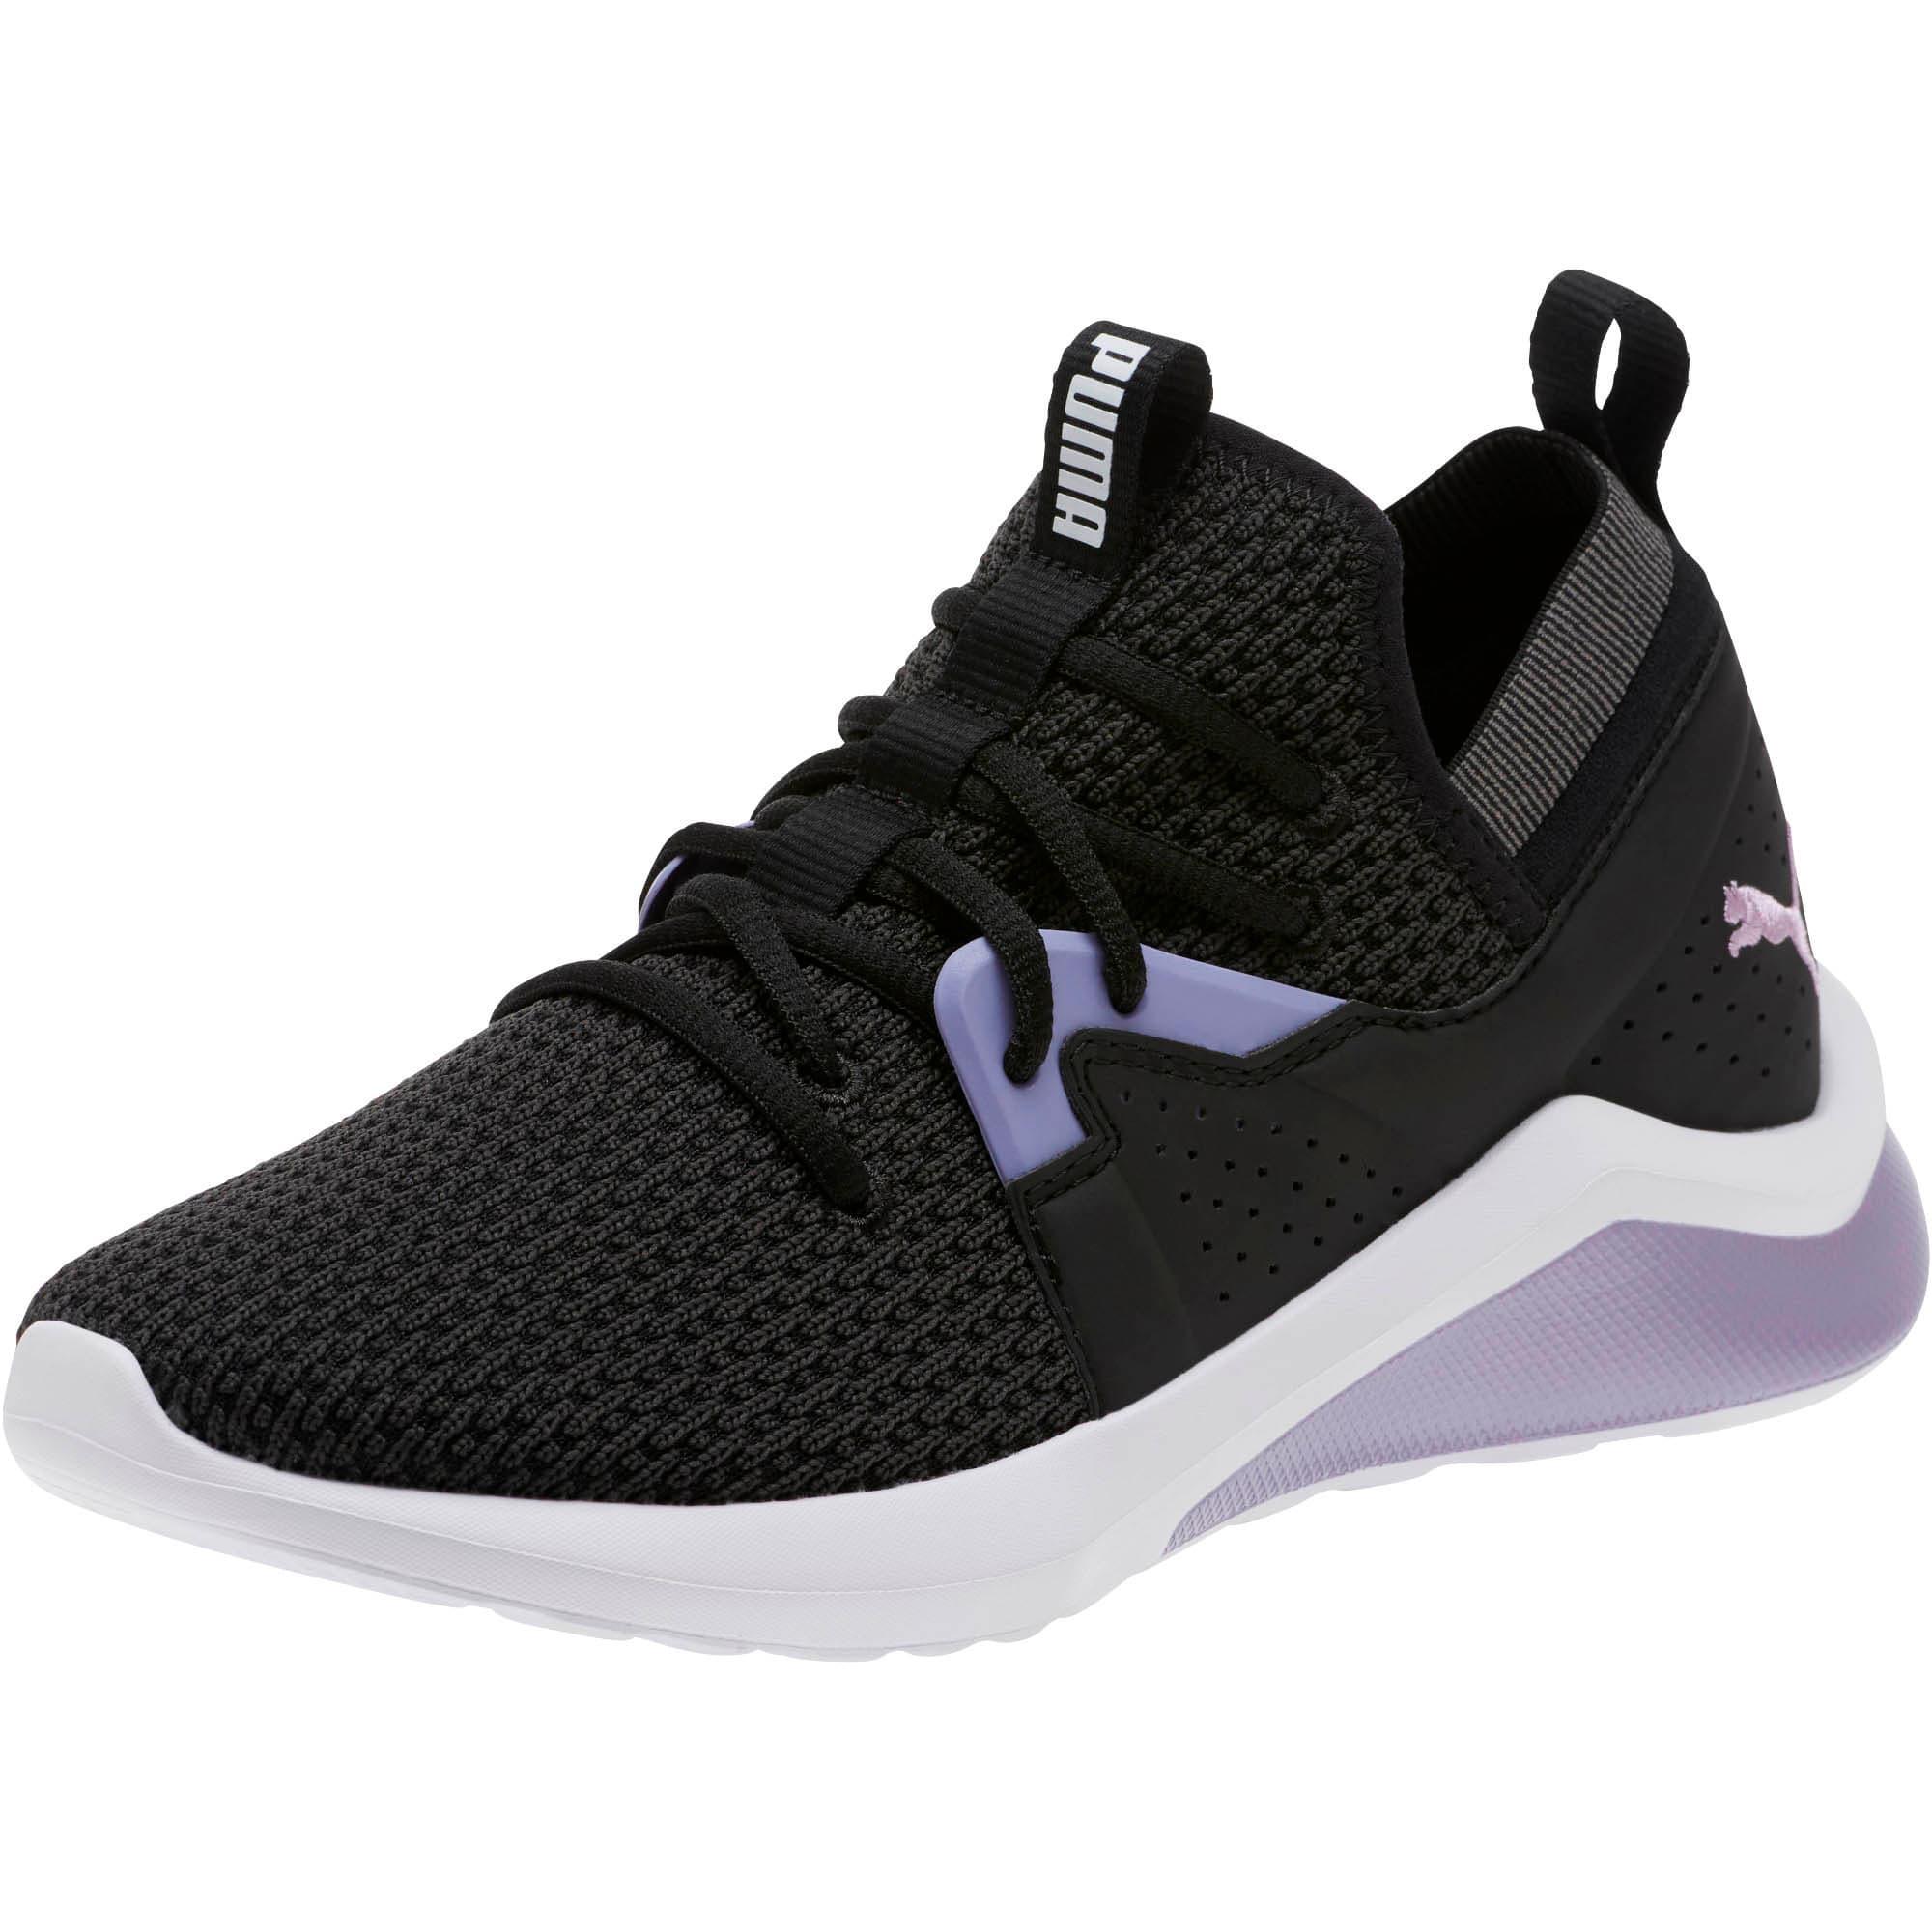 Thumbnail 1 of Emergence Cosmic Women's Sneakers, Puma Black-Sweet Lavender, medium